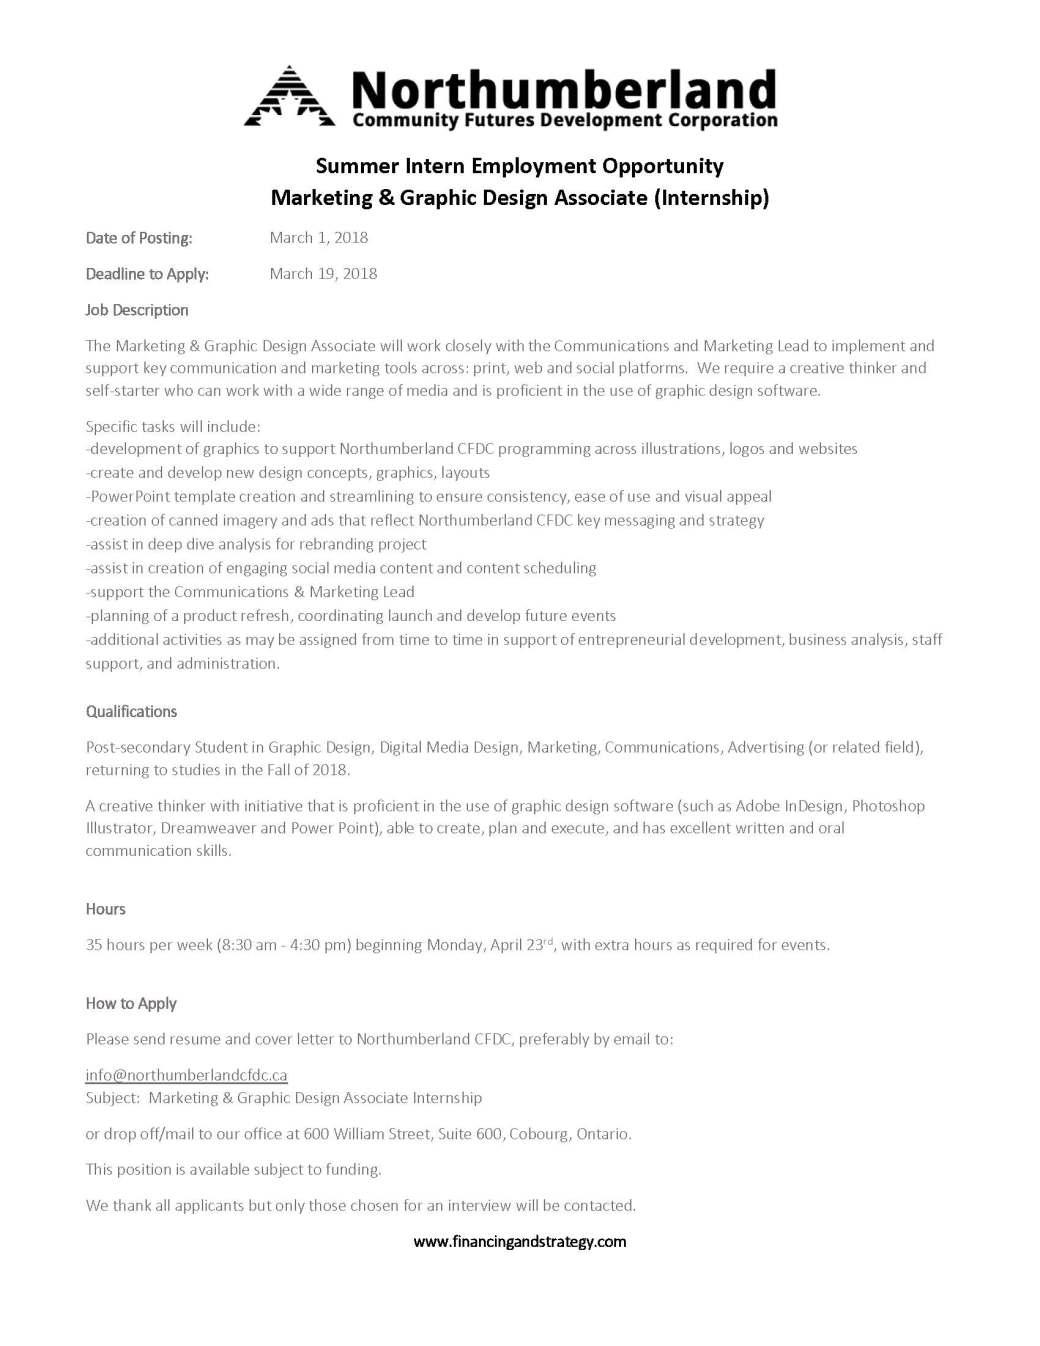 External Internship PAID – Marketing and Graphic Design Associate